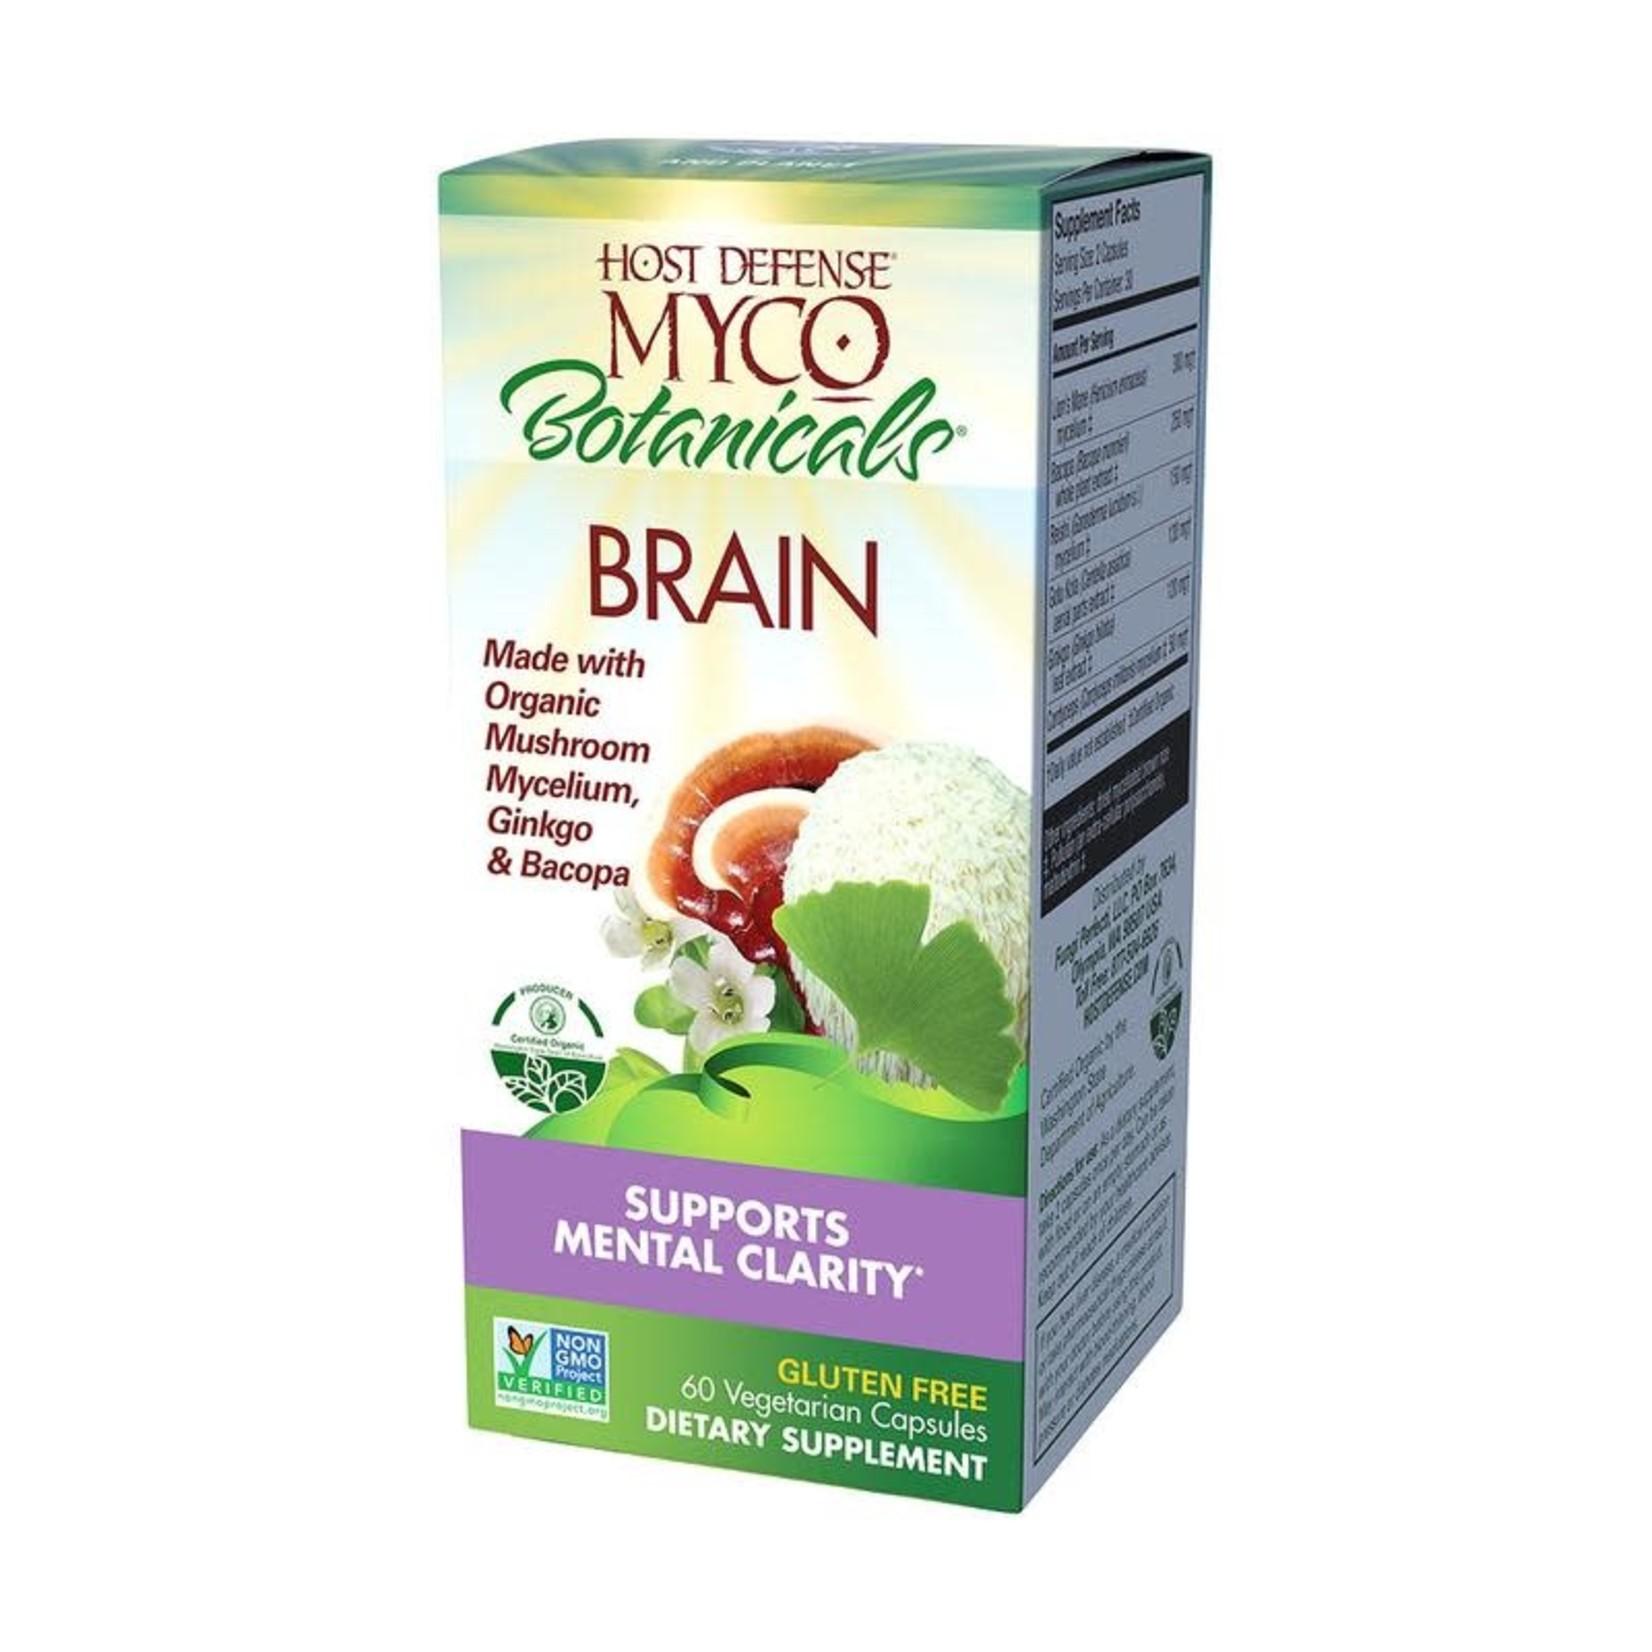 Host Defense HD Myco Botanicals Brain 60 Capsules